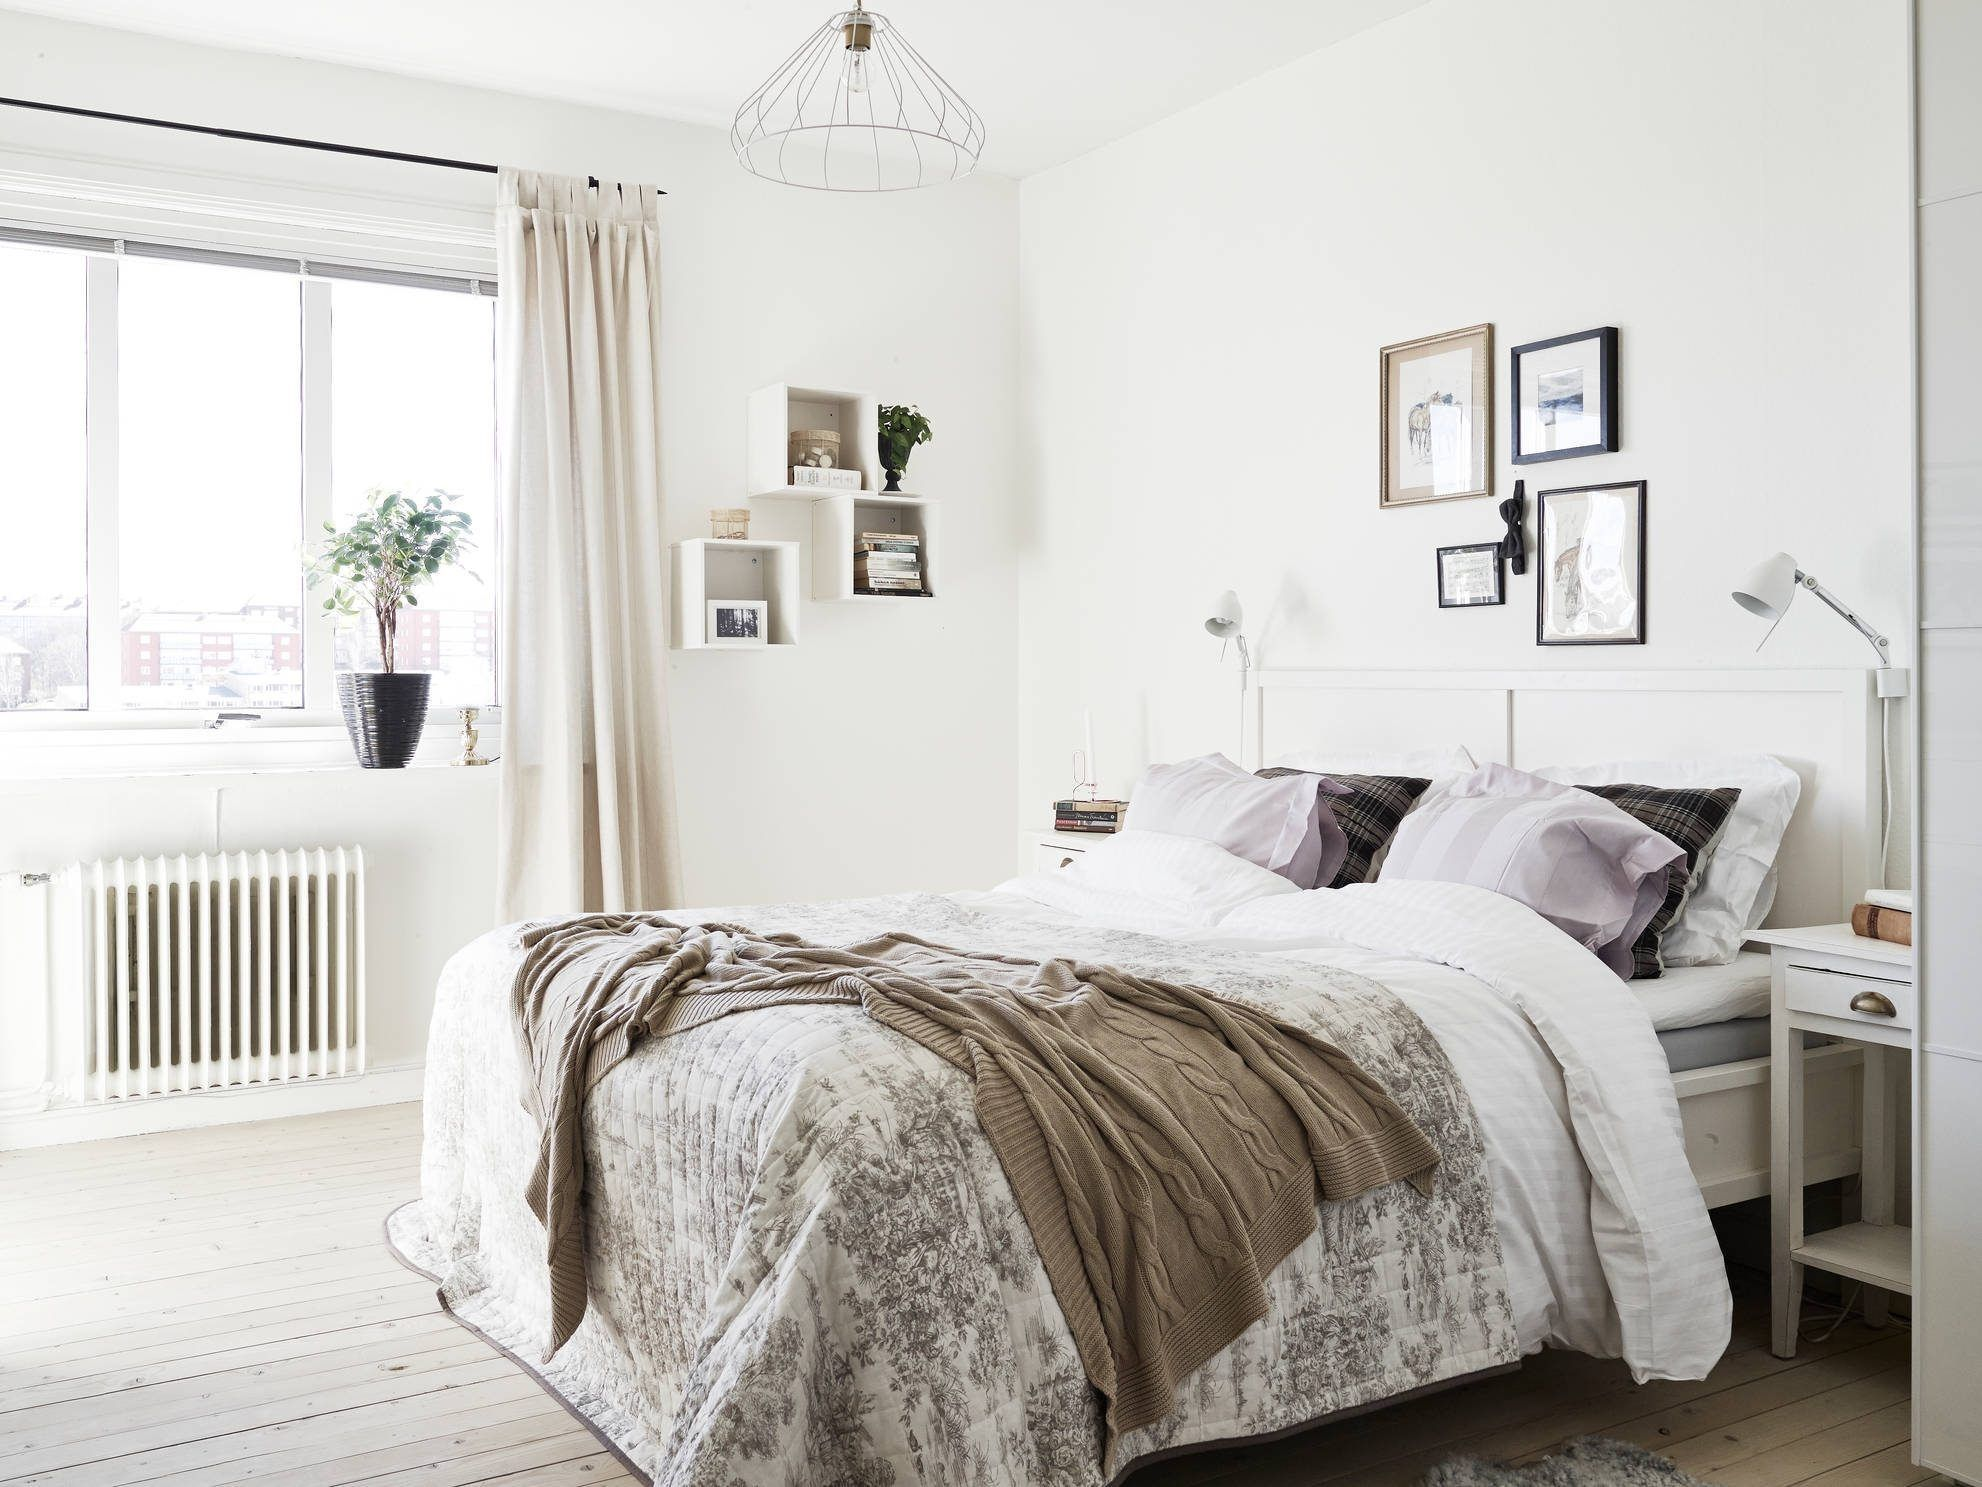 Furniture : Scandinavian Bedroom Furniture French Country Also Style Bedroom  Furniture Scandinavian Bedroom Furniture Scandinavian Furniture Bedroomsu201a  ...